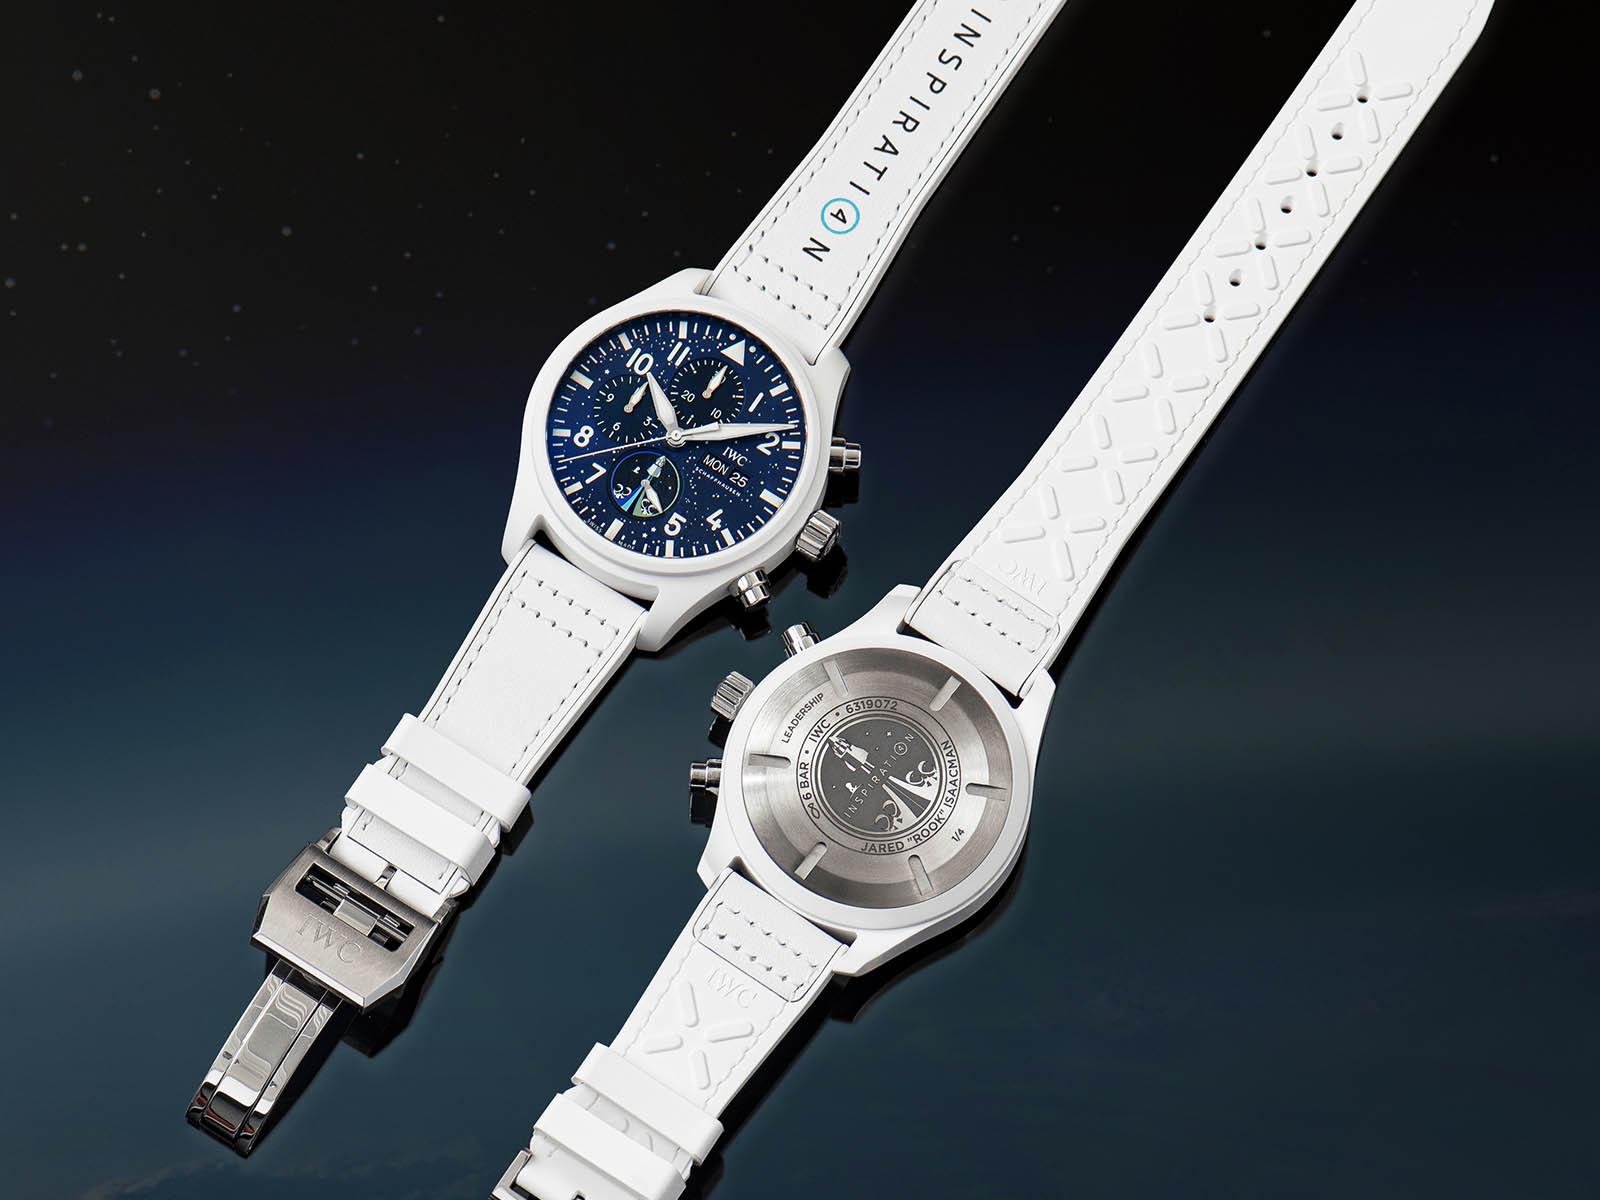 iw389110-iwc-pilot-s-watch-chronograph-edition-inspiration4-3.jpg